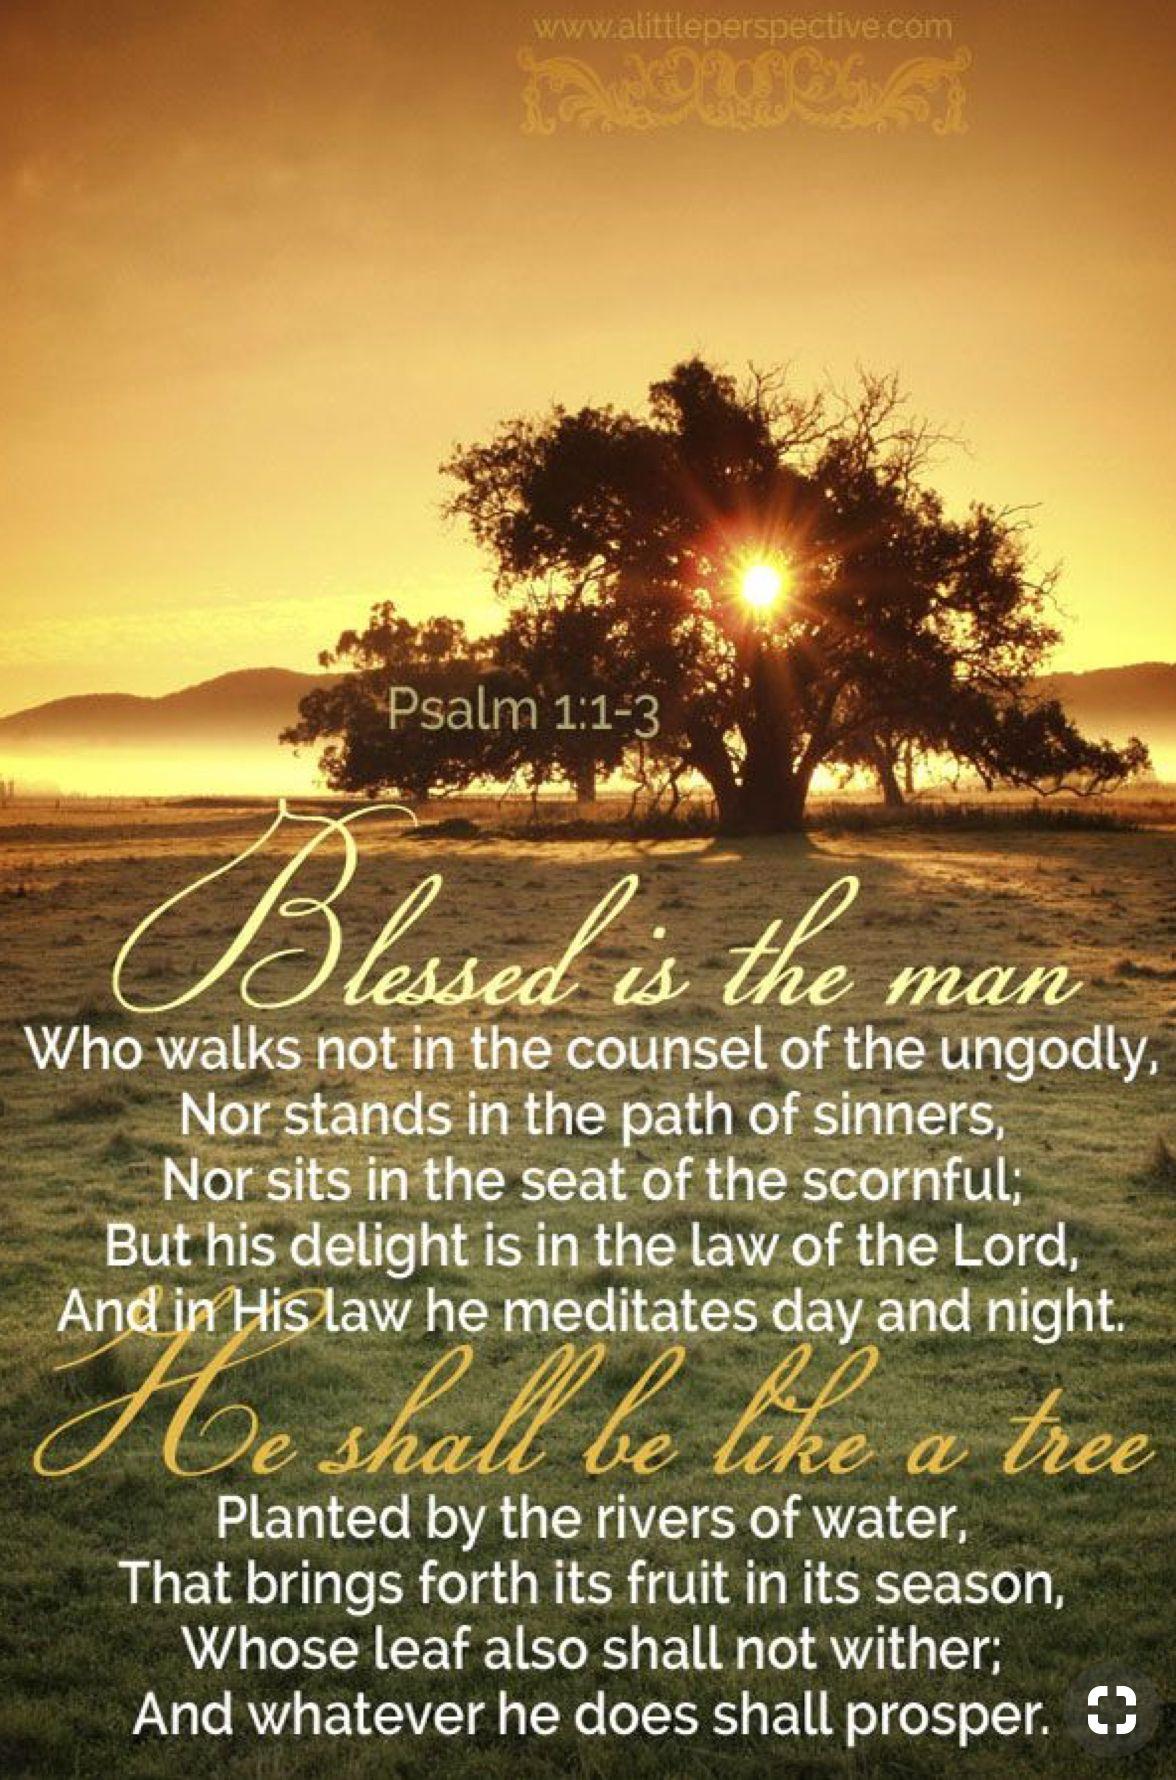 Psalm 1:1-3💛 | Bible Verses | Scripture pictures, Psalm 1 ...